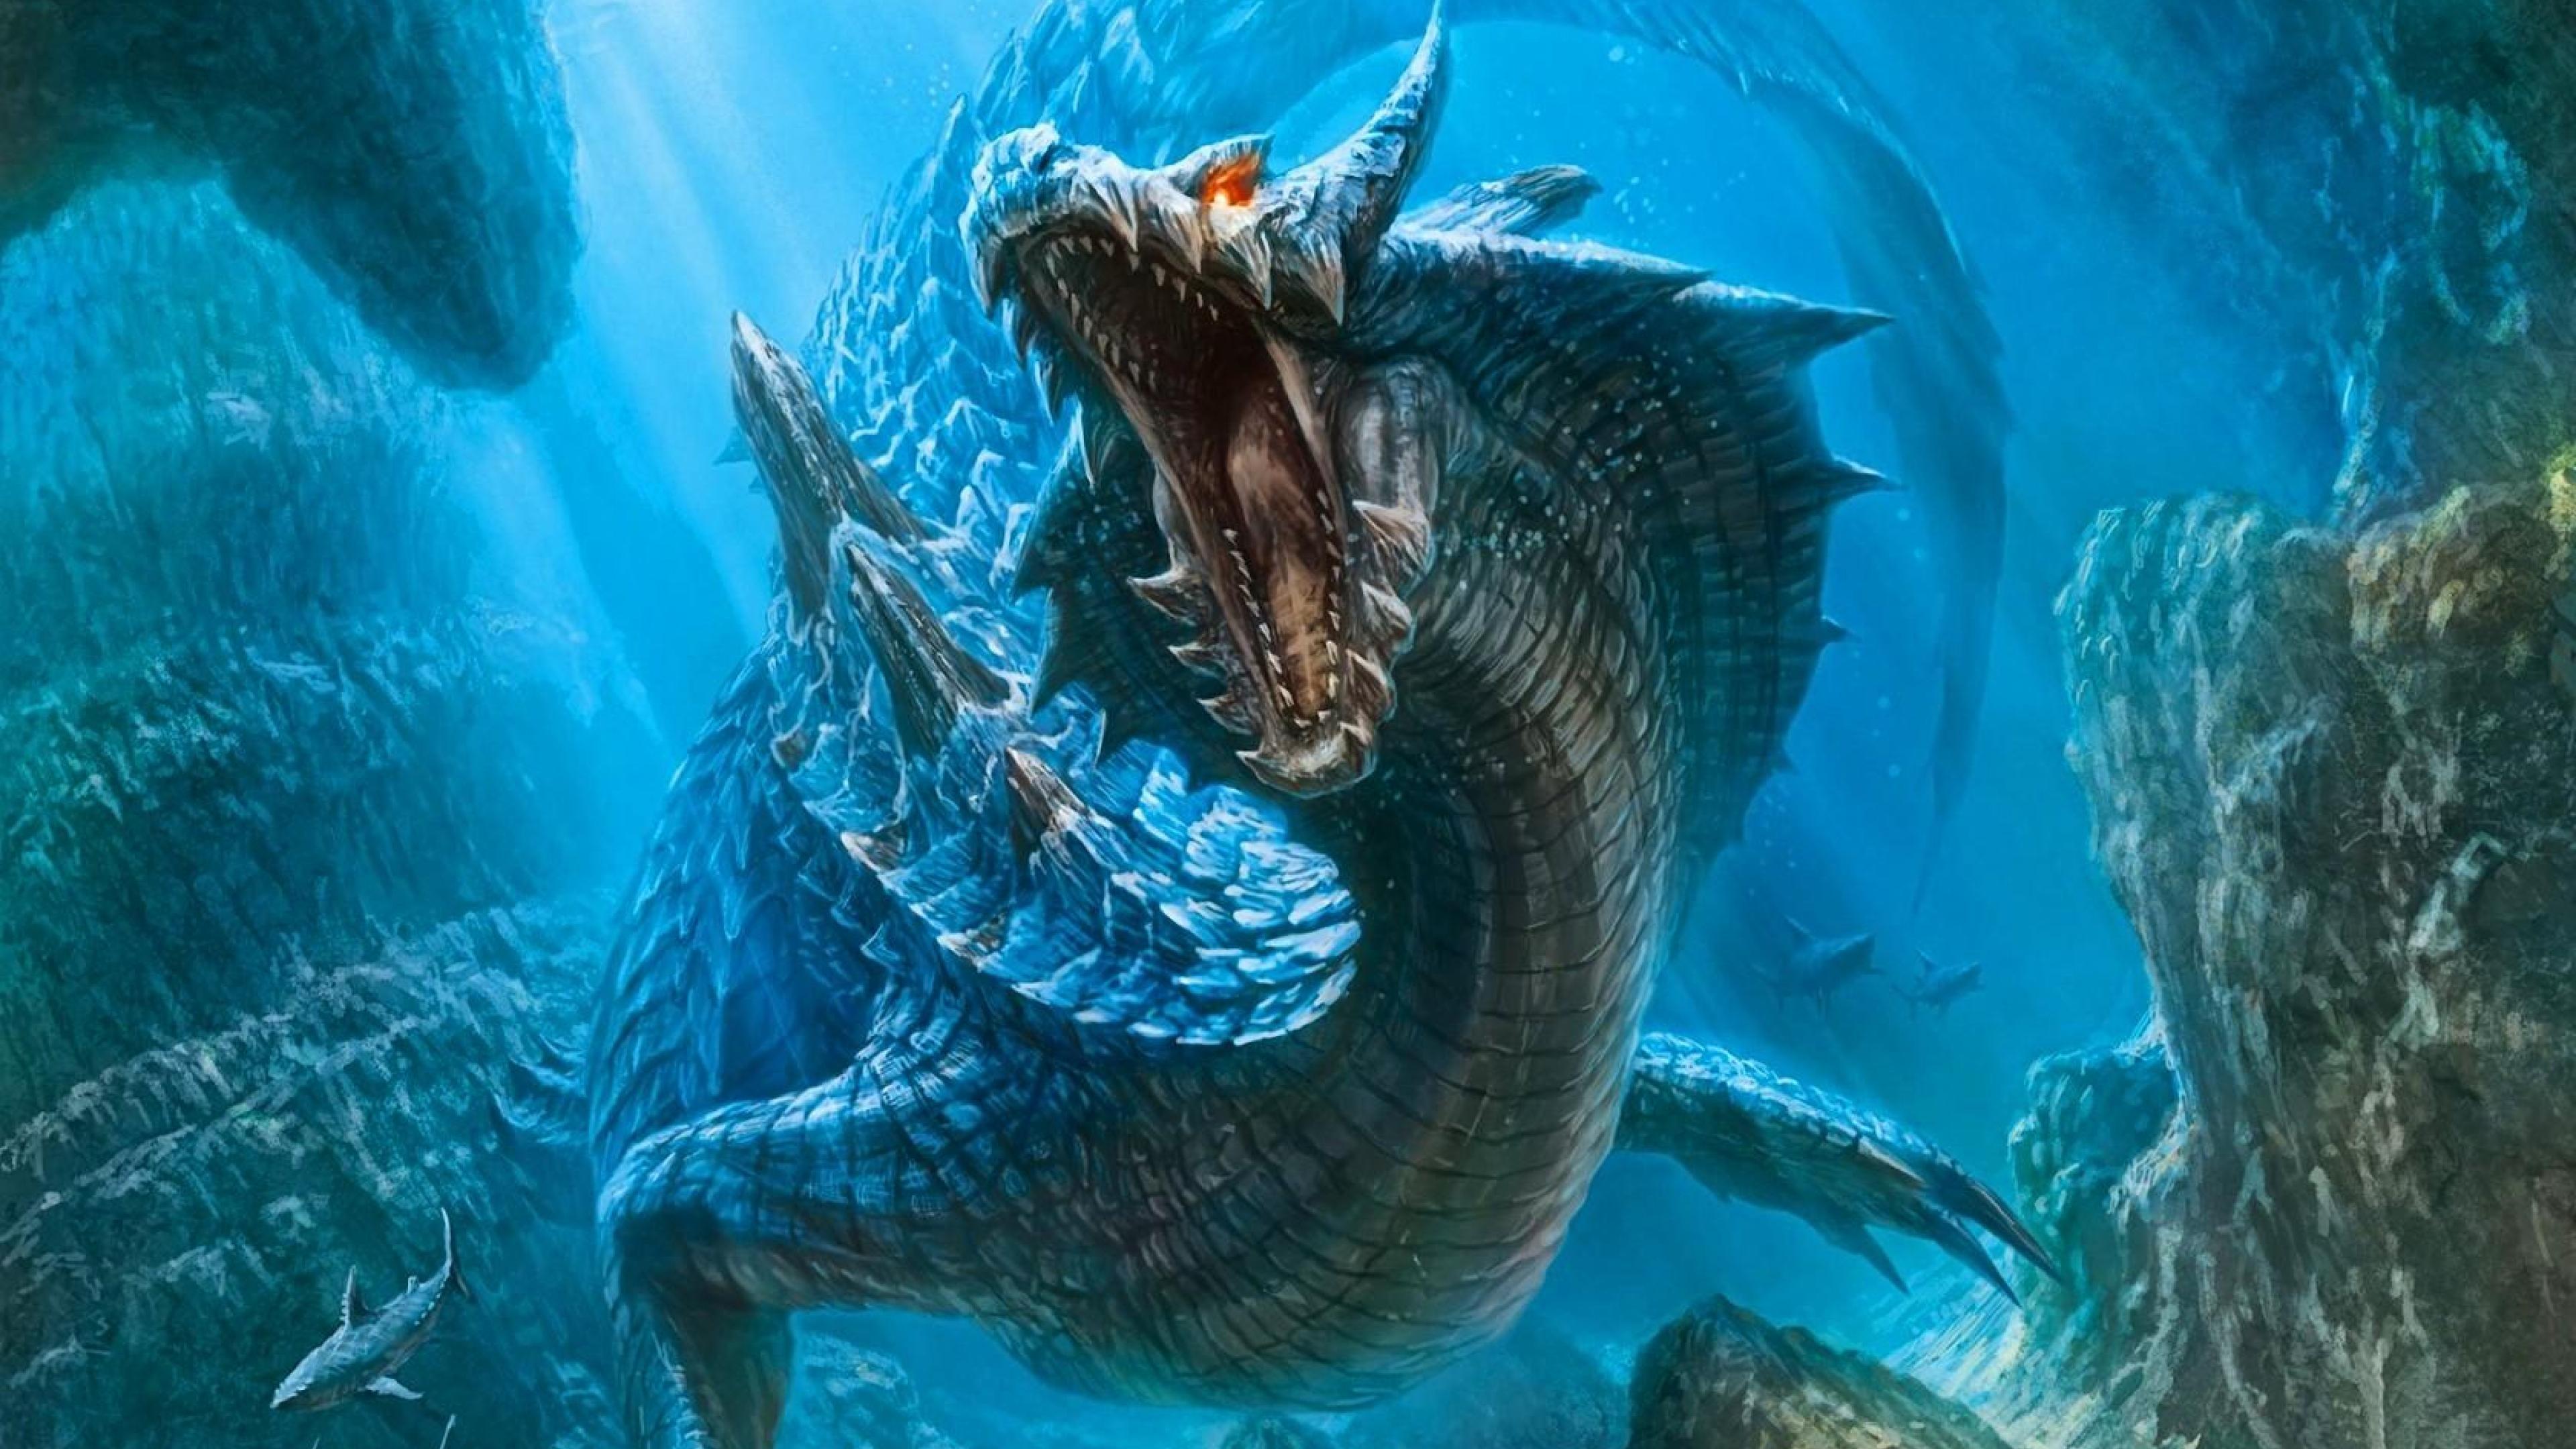 Lagiacrus Dragon Sea Shark Water Monster hunter HD Wallpapers .